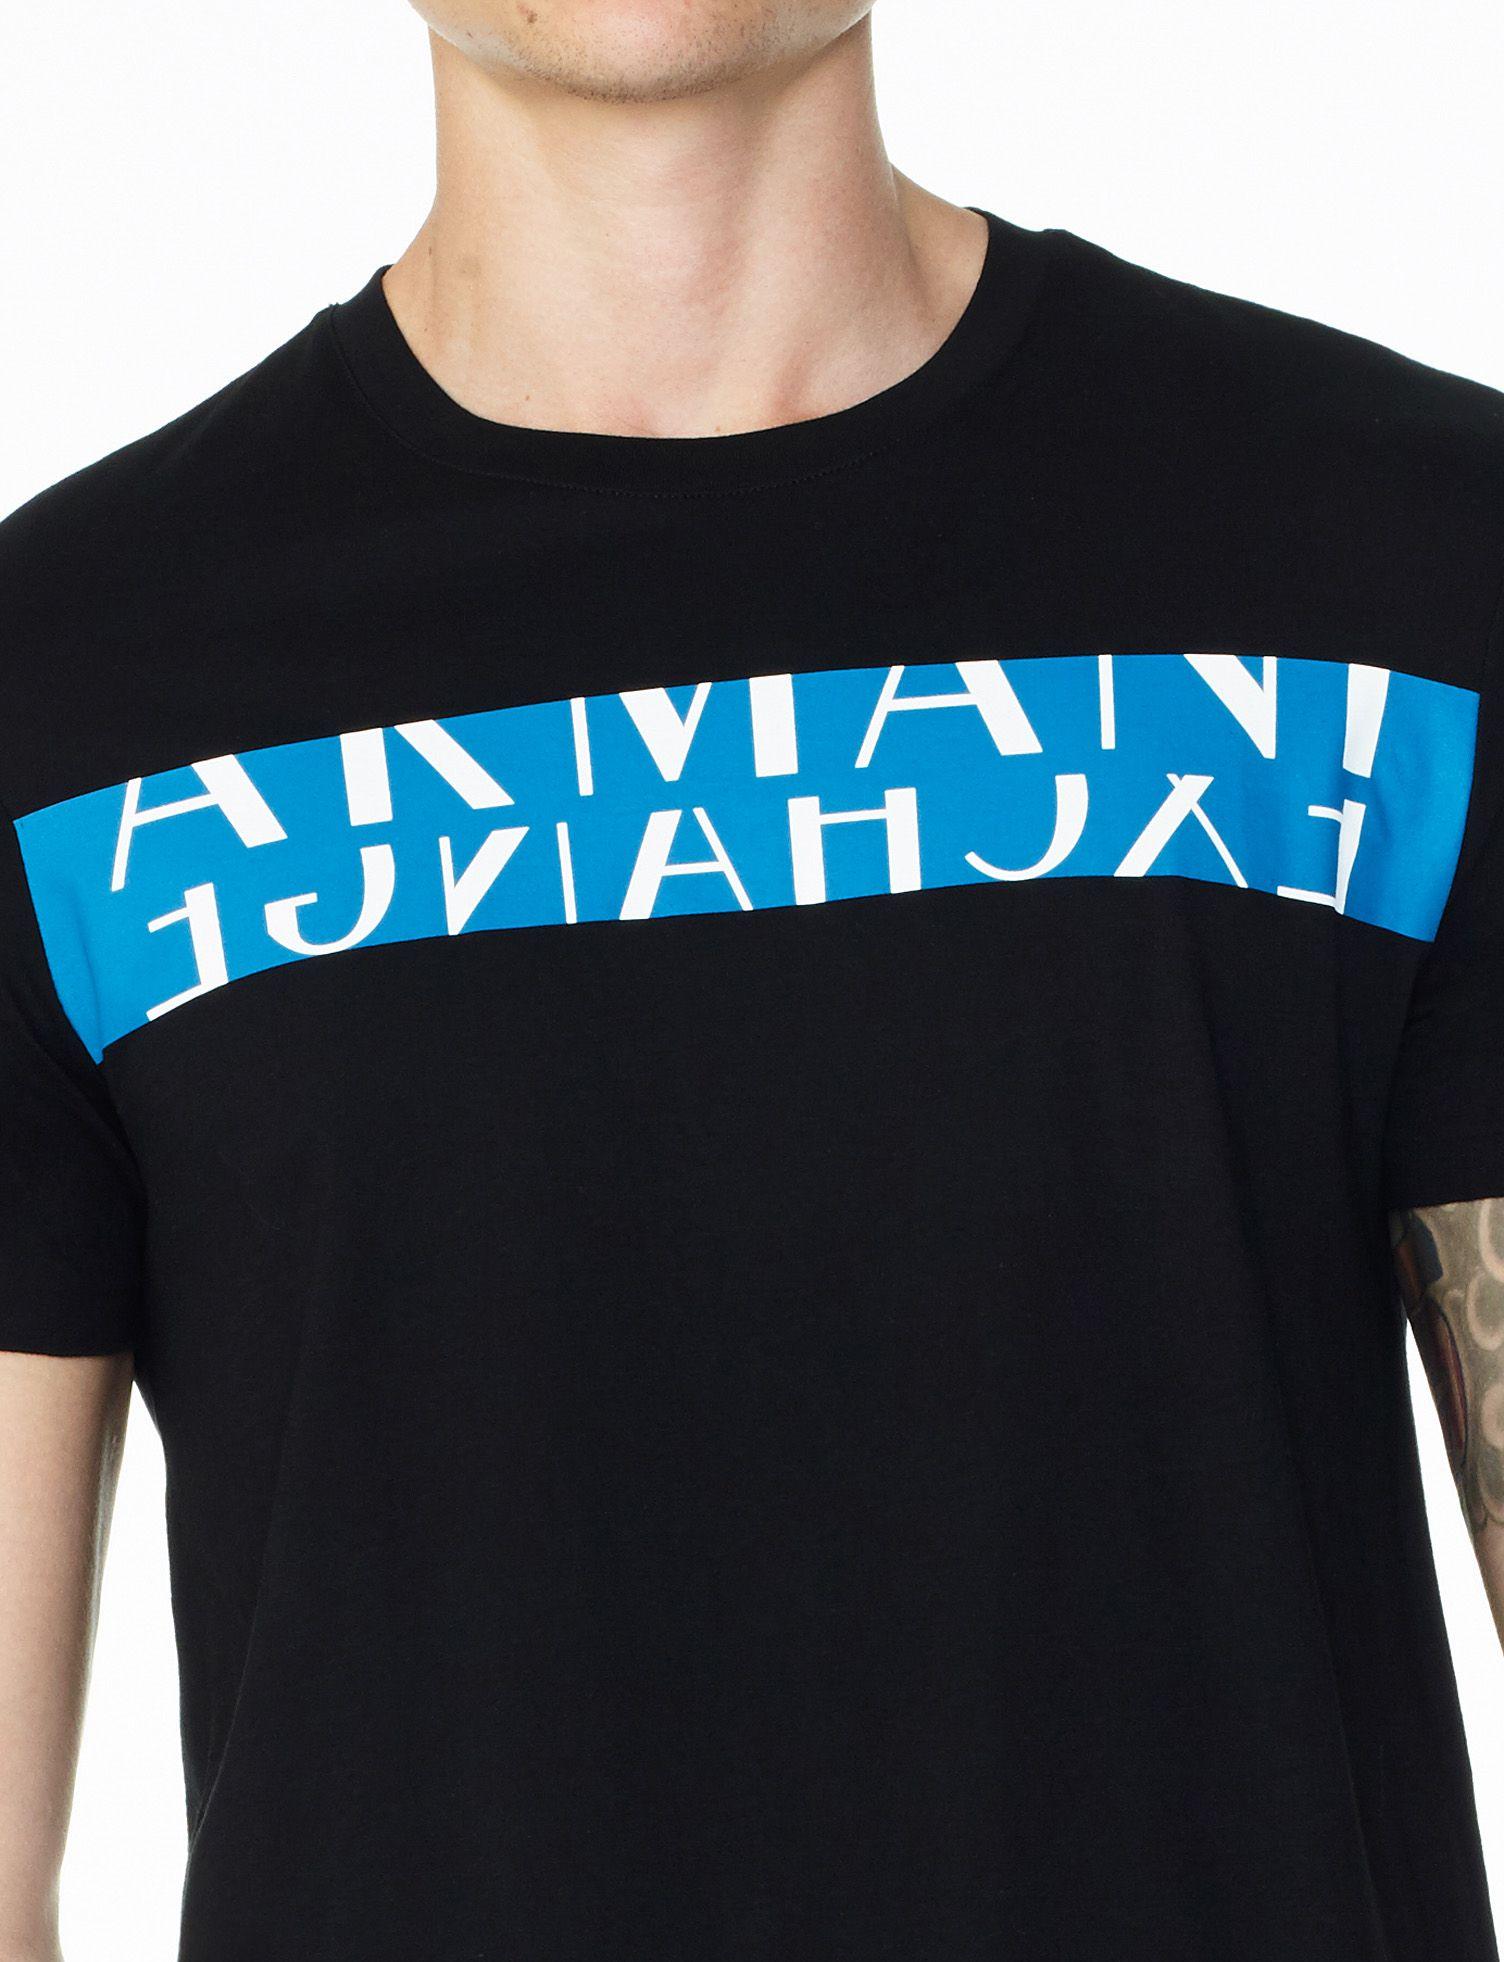 Camiseta Armani Exchange Preta - EuEnvio Importados  Relógios ... 2a234c02adf13